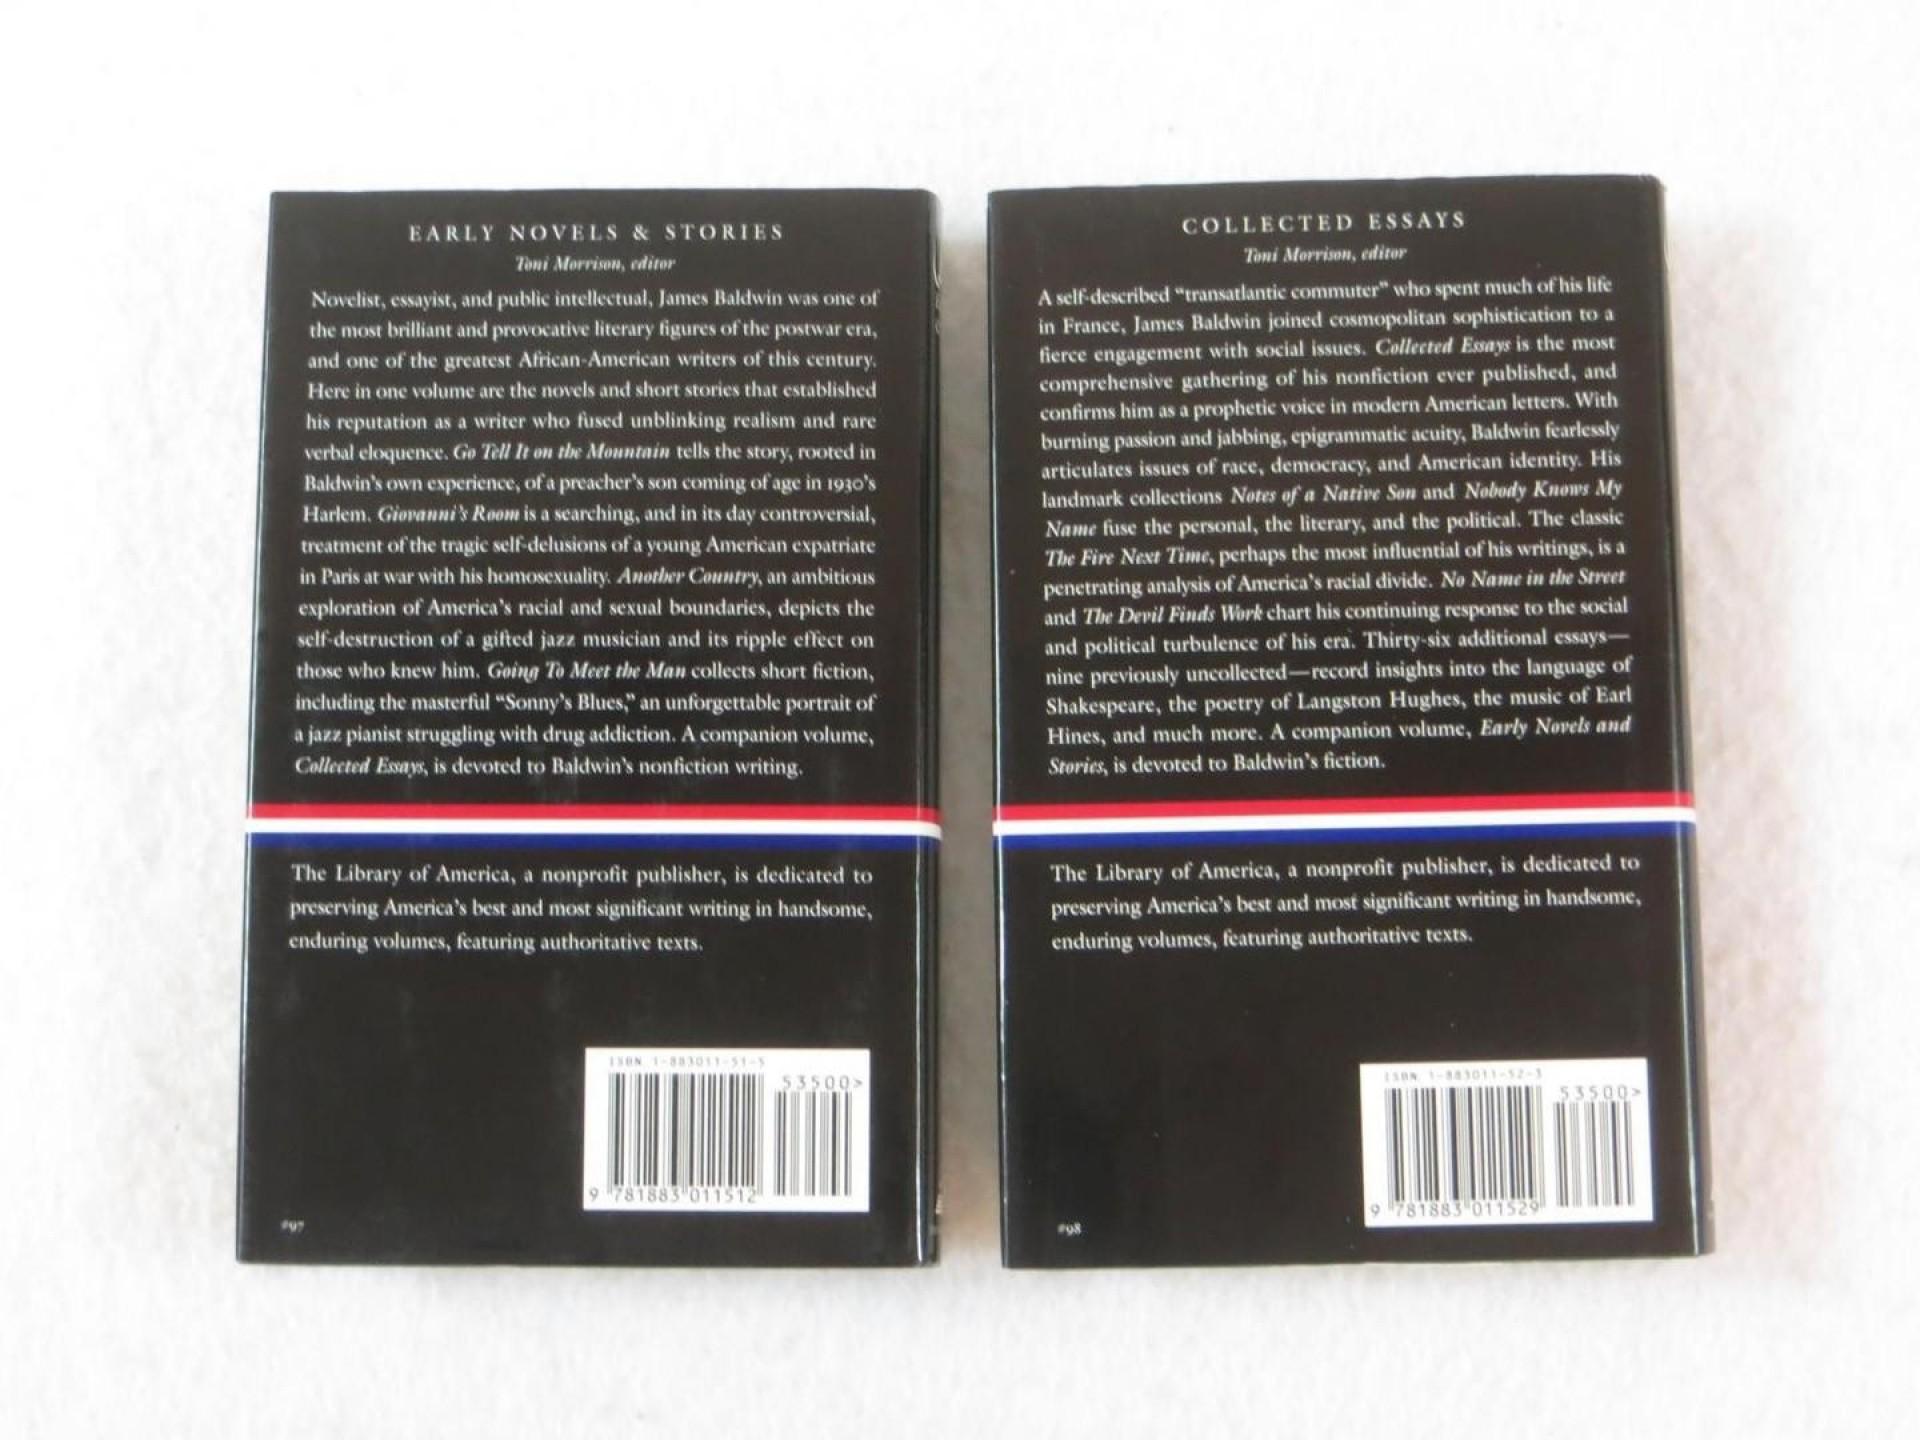 015 Lot James Baldwin Early Novels 1 928ee5893cf657b9cc053e80e6d2614e Essay Example Collected Wondrous Essays Table Of Contents Ebook Google Books 1920